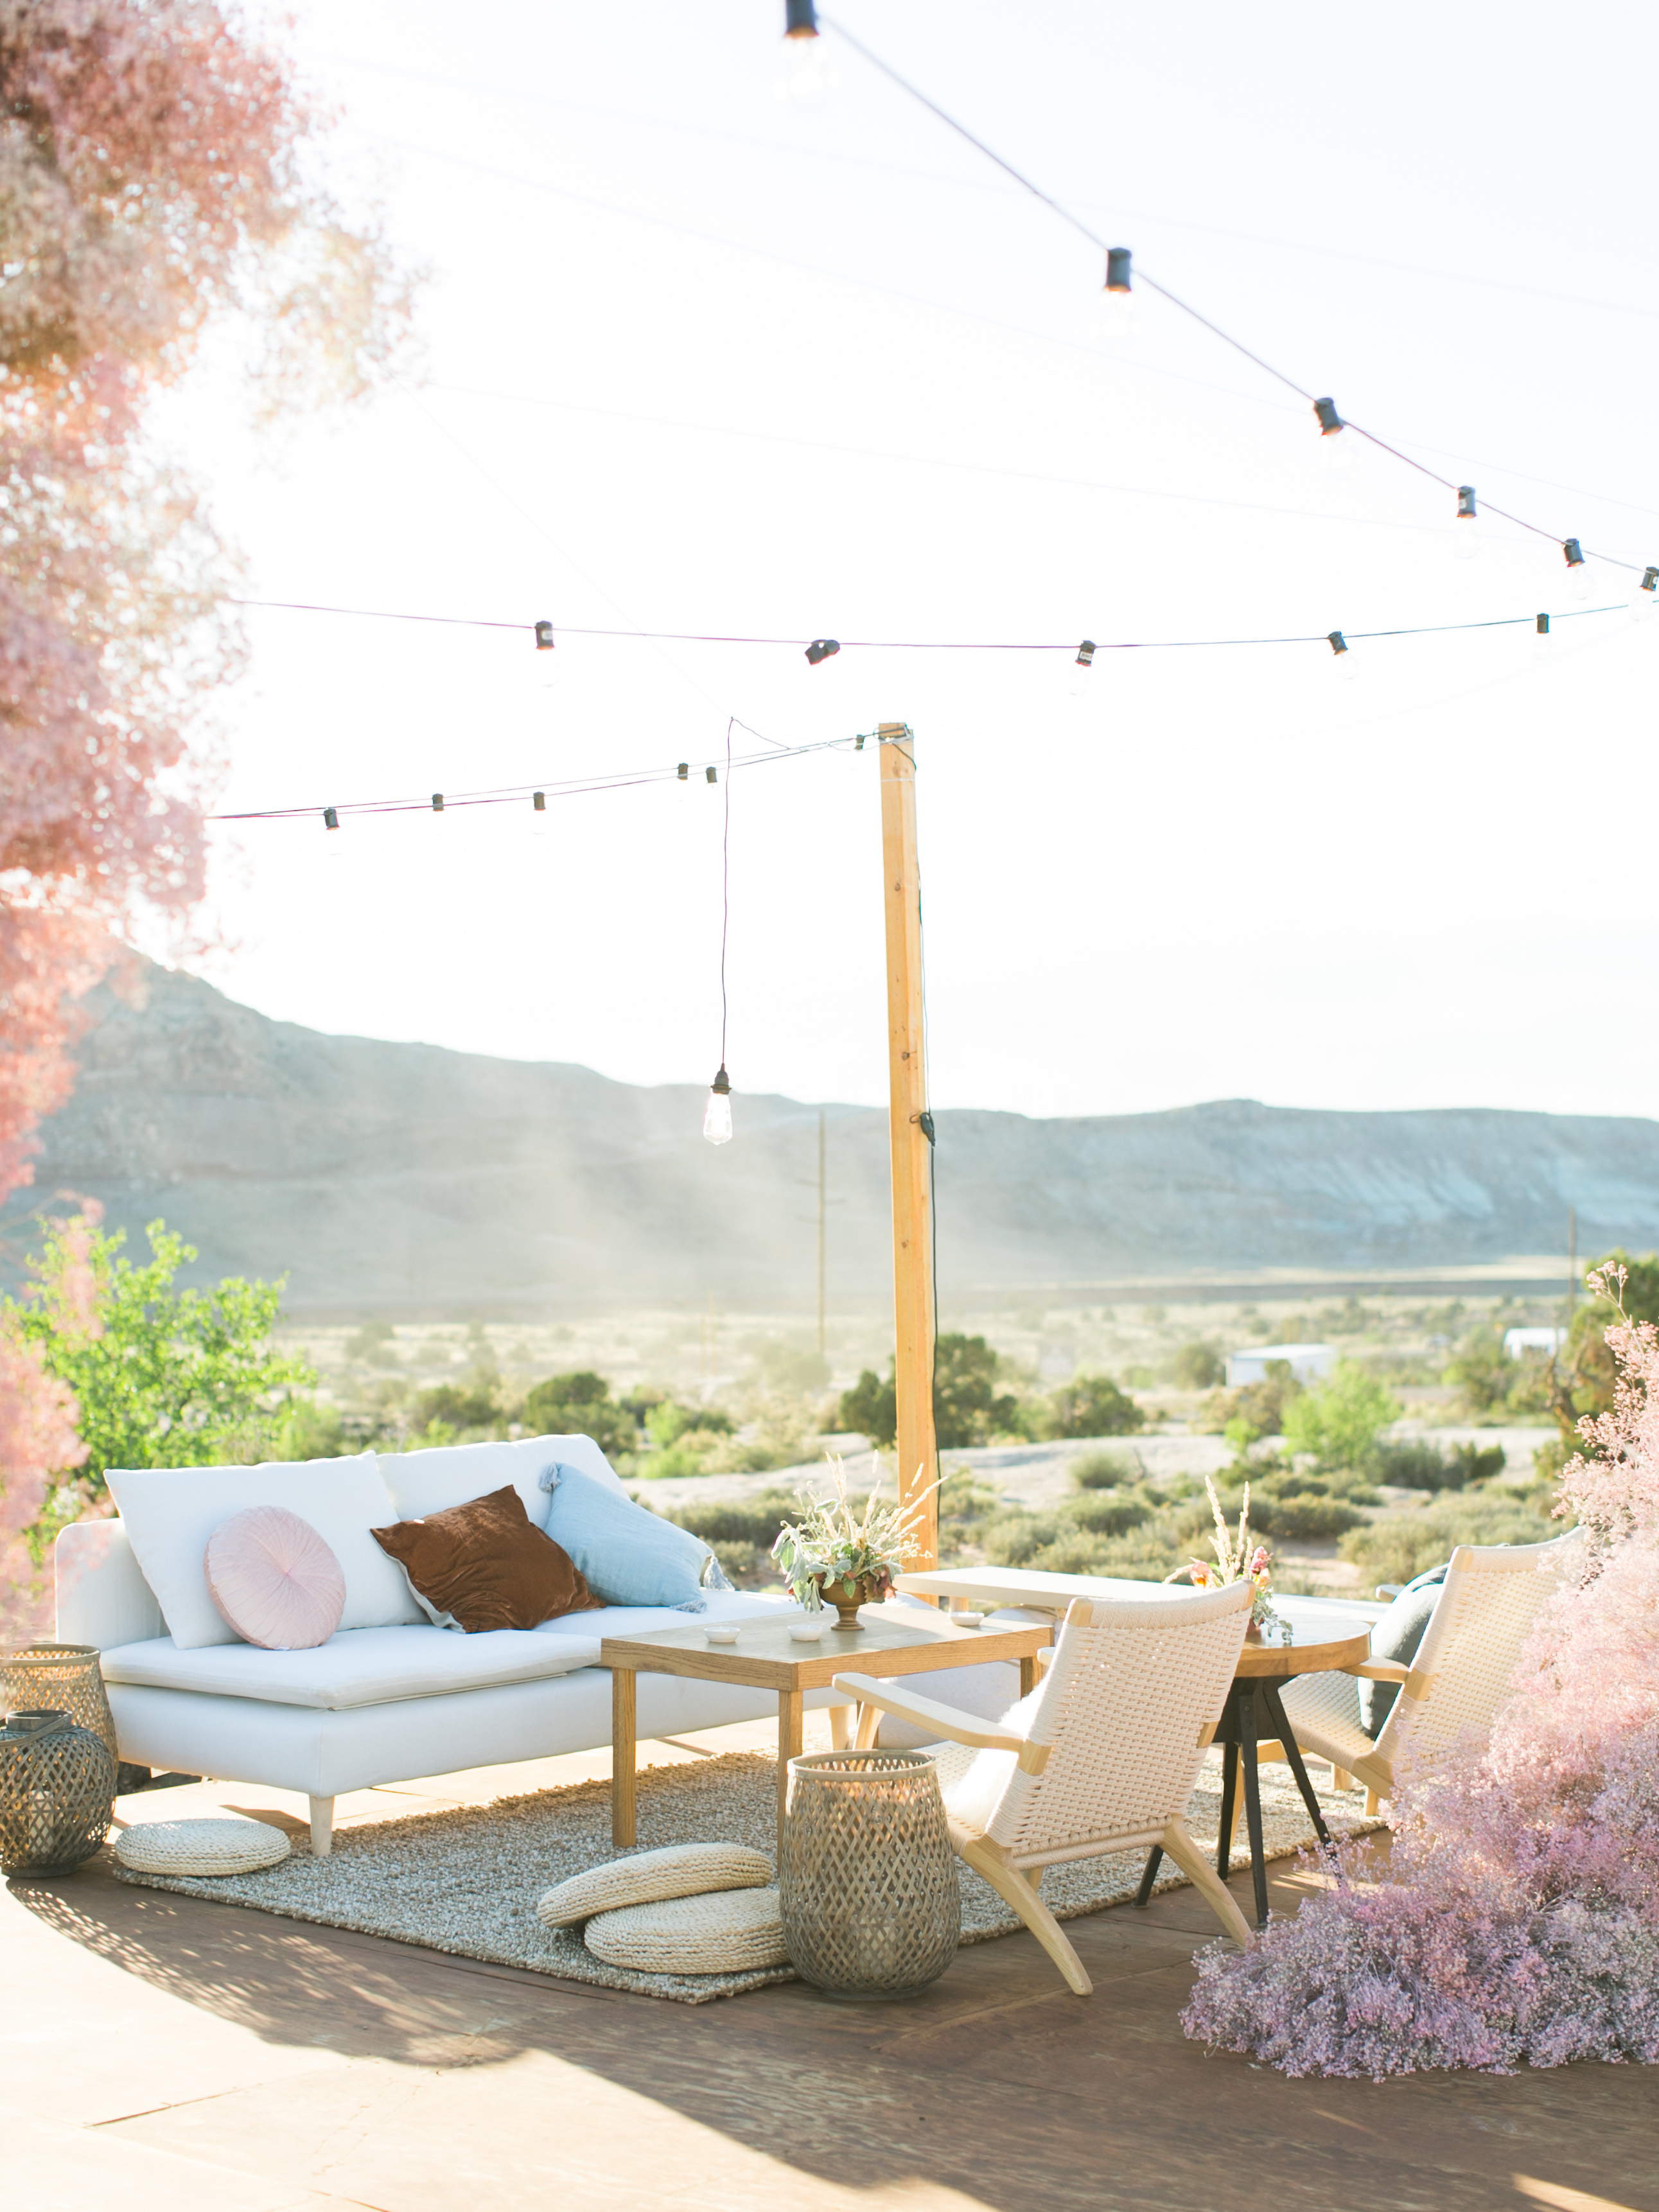 jeanette david wedding outdoor lounge area